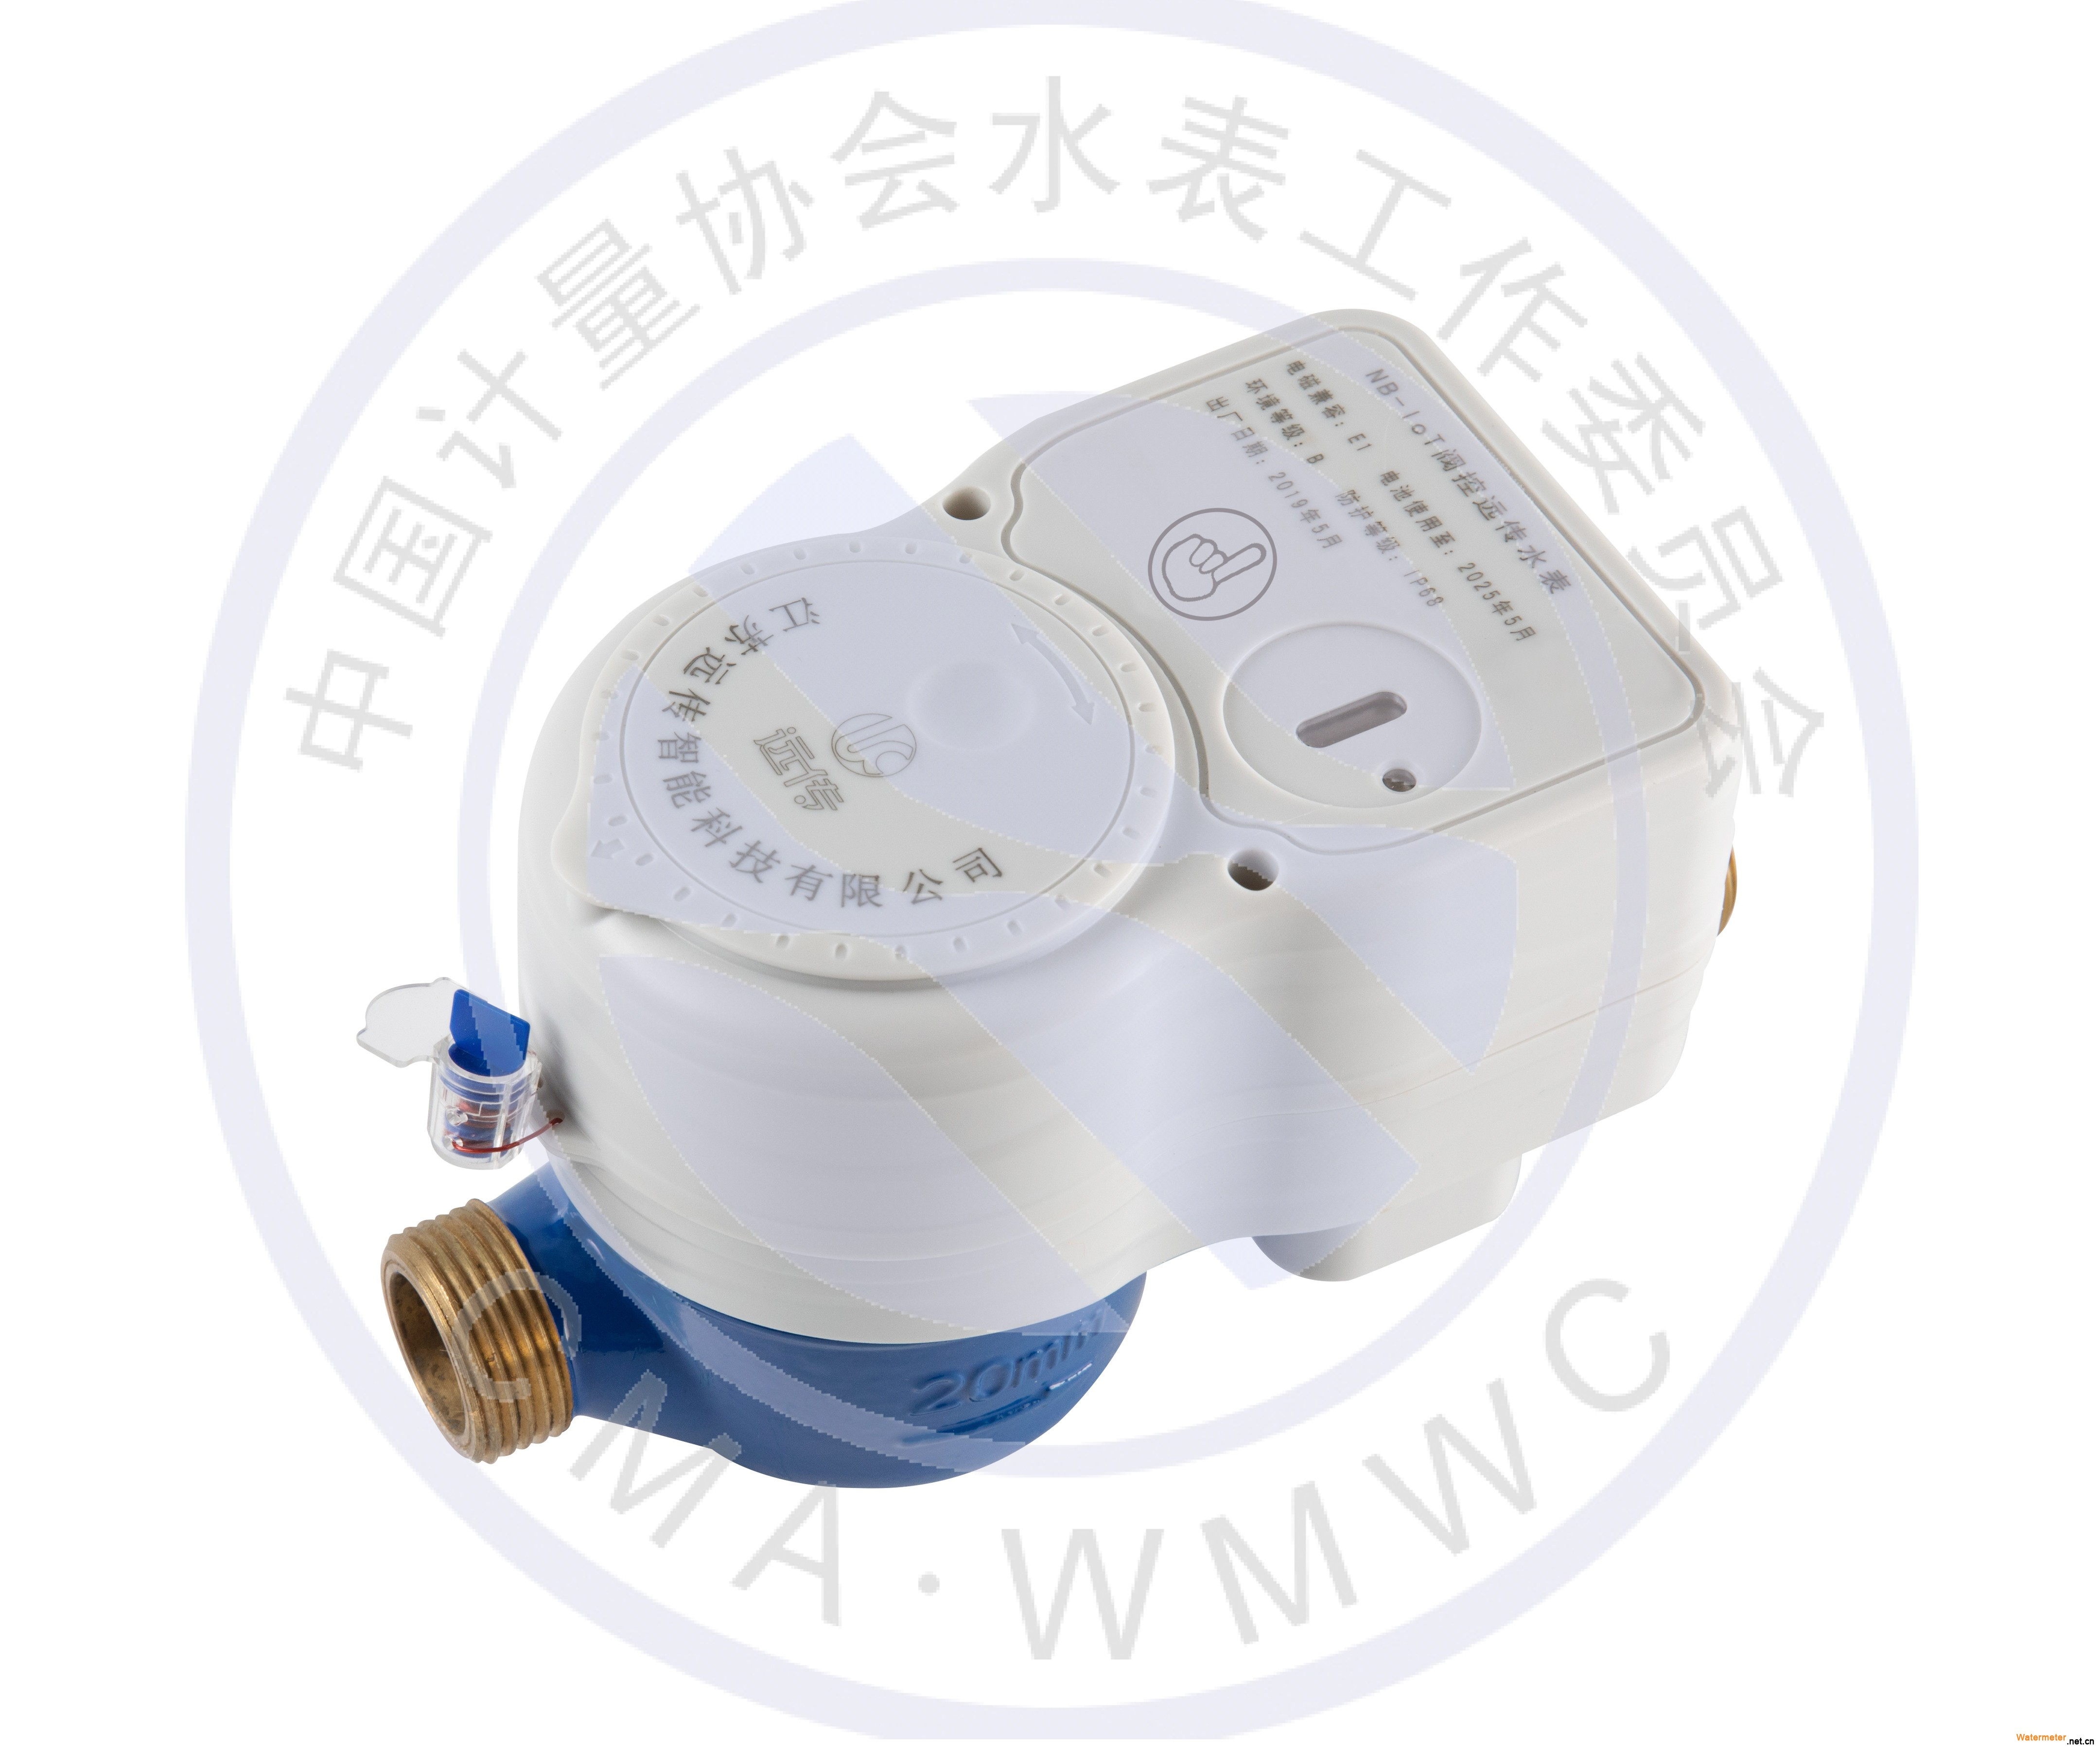 6、NB-IoT无磁传感物联网阀控水表